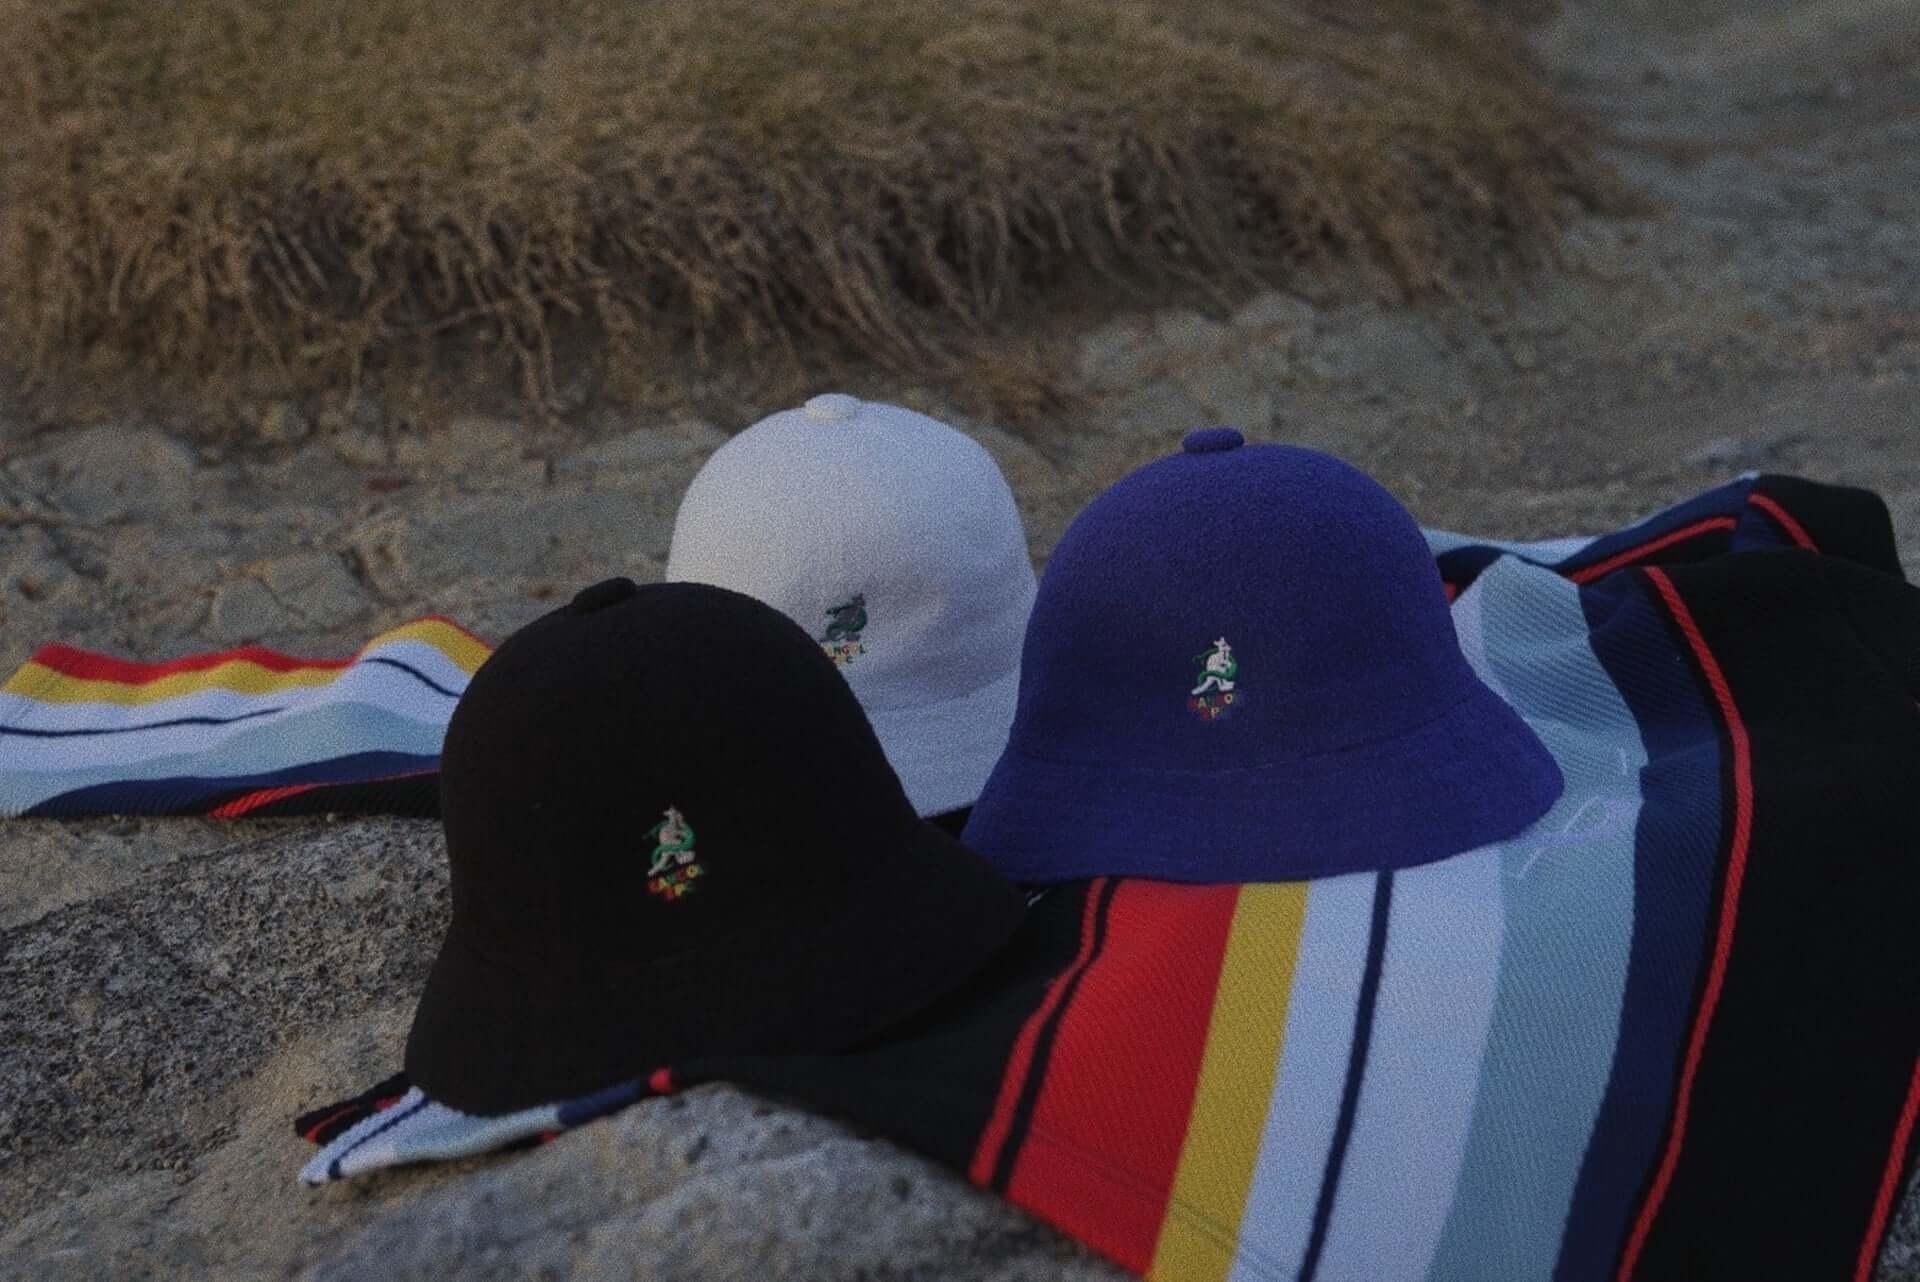 VERDY、谷篤人、稲葉冬樹が手掛けるZepanese ClubとKANGOLのコラボハットが発売決定!IMA:ZINE限定カラーも展開 lf210224_kangol_12-1920x1282